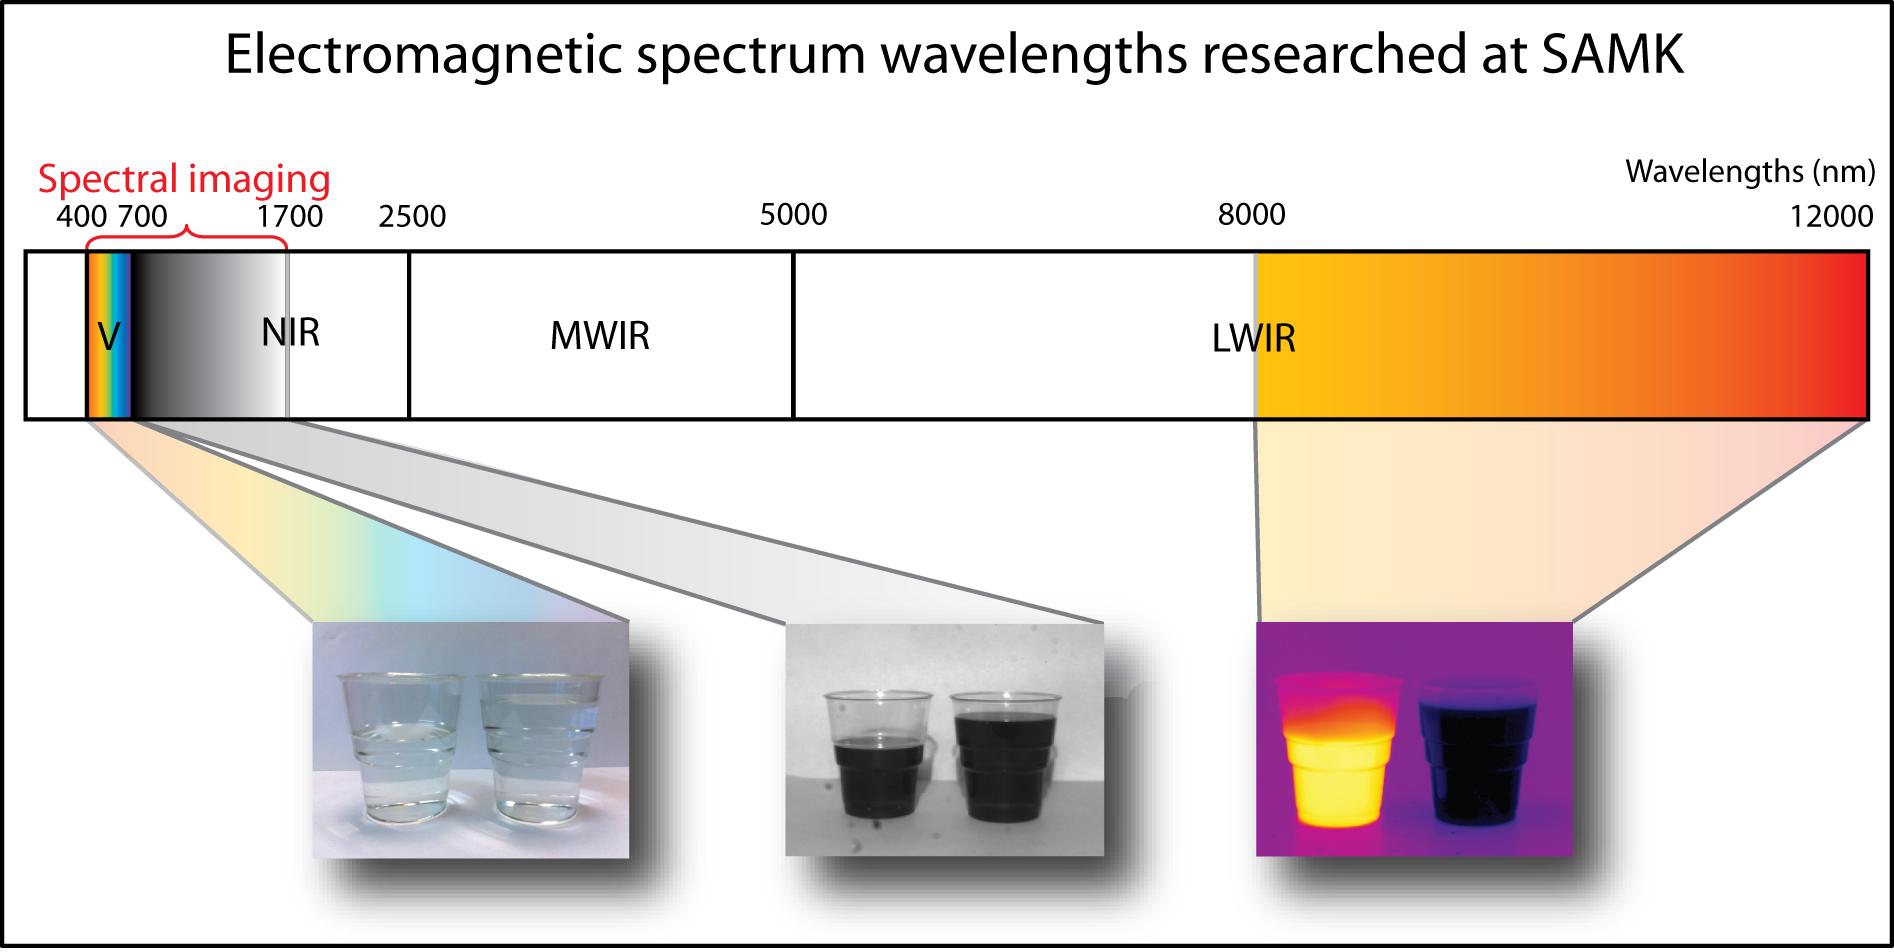 Electromagnetic spectrum wavelengths researched at SAMK